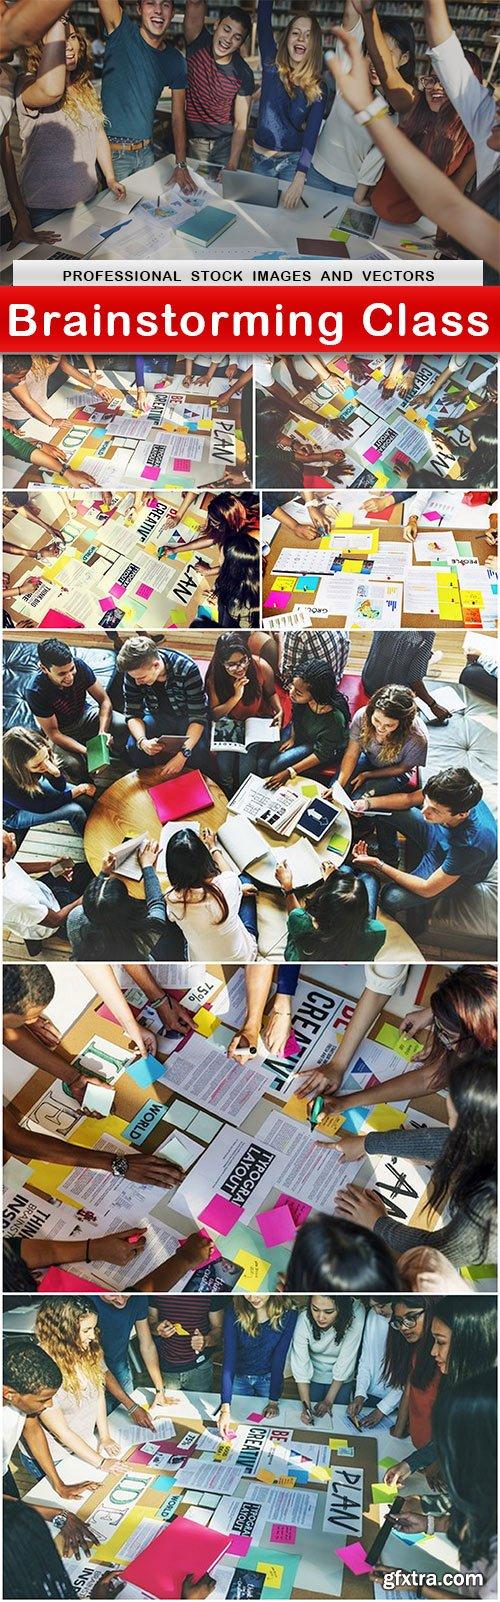 Brainstorming Class - 8 UHQ JPEG